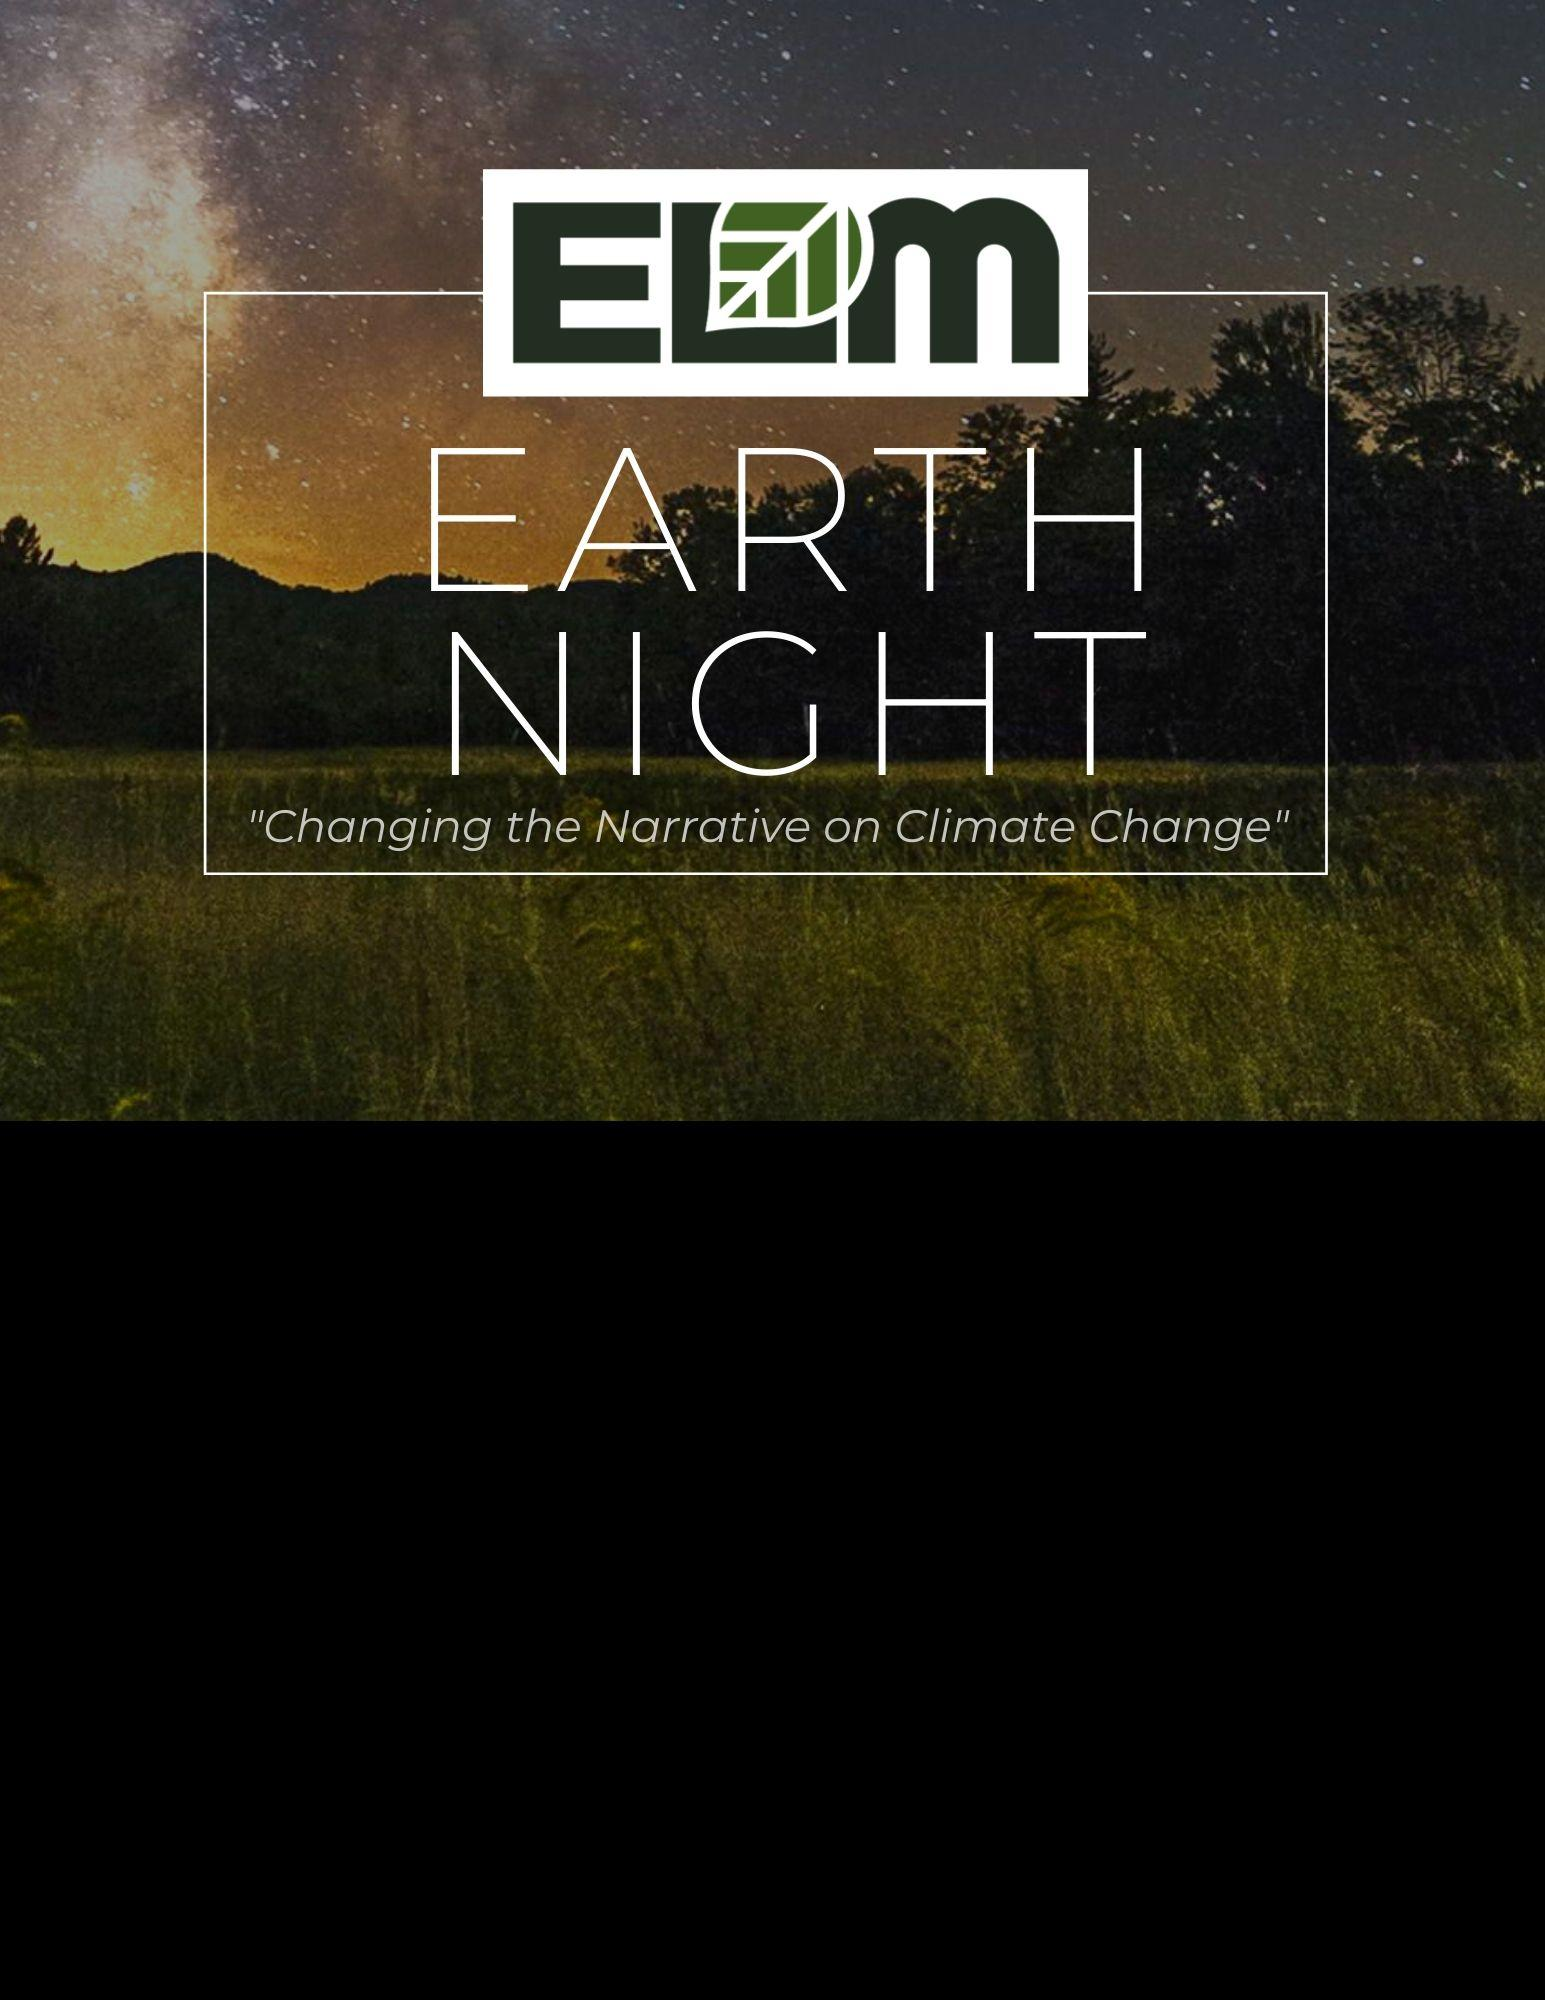 Earth Night 2020- POSTPONED TO FALL 2020